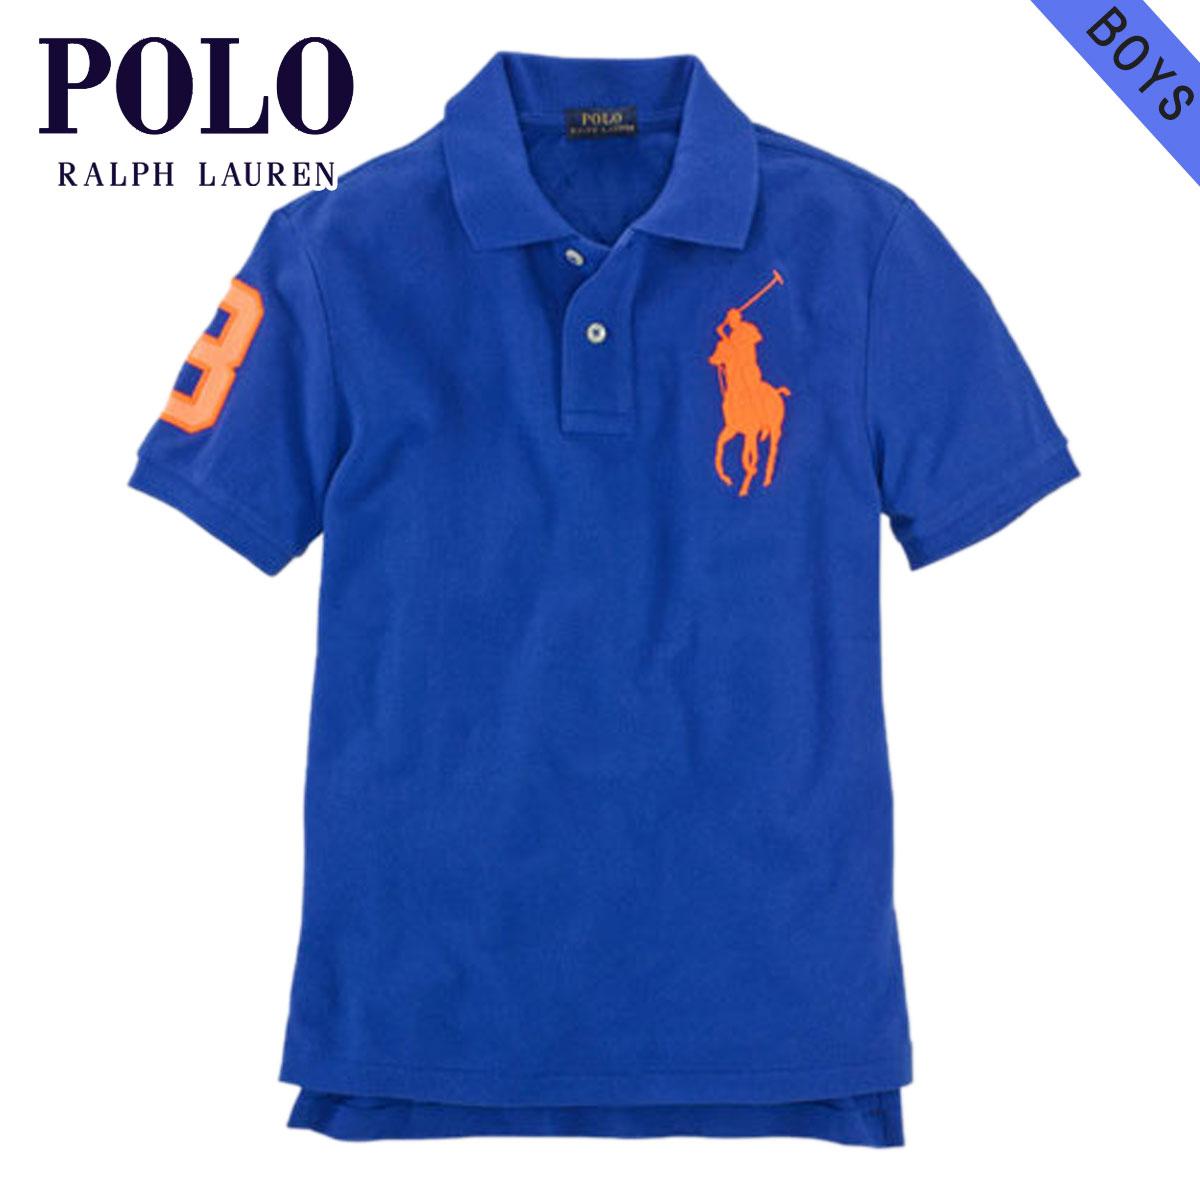 bb1a33aae6251 Polo Ralph Lauren kids POLO RALPH LAUREN CHILDREN regular article children s  clothes boys polo shirt Custom-Fit Big Pony Polo Shirt 52138556 D20S30